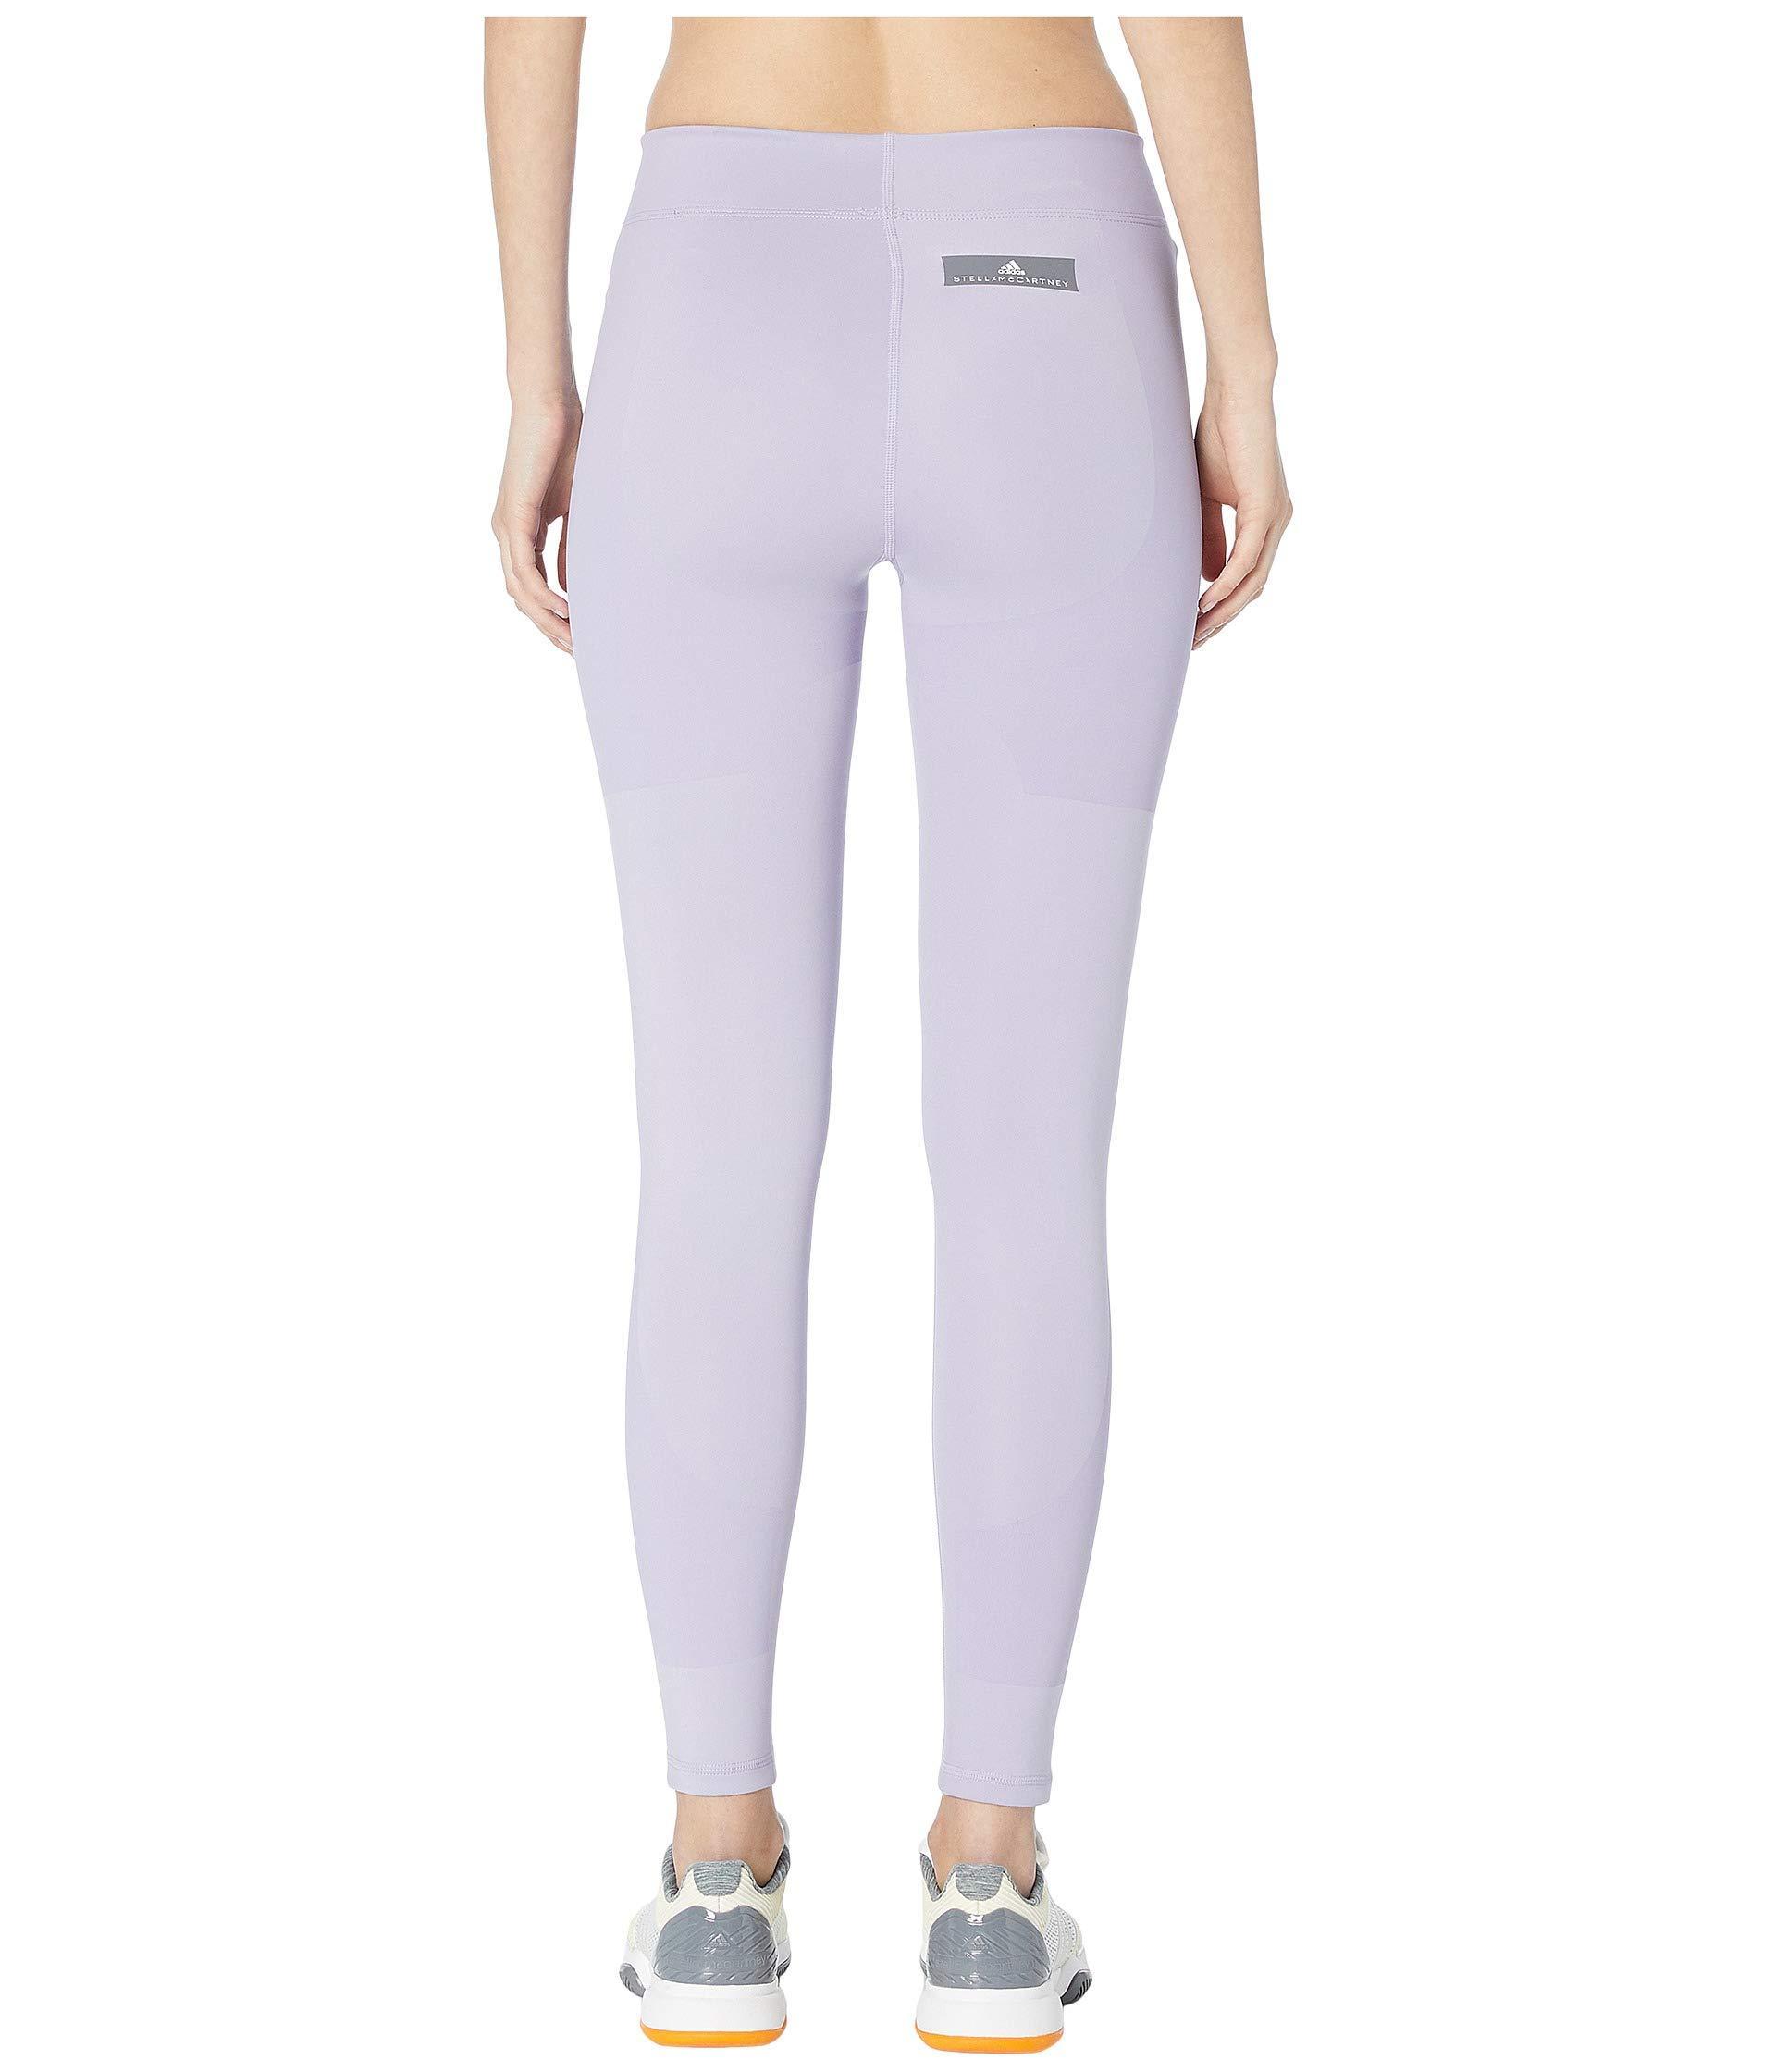 e36f238e03dc77 adidas By Stella McCartney Train Tights Dw9576 (iced Lavender ...